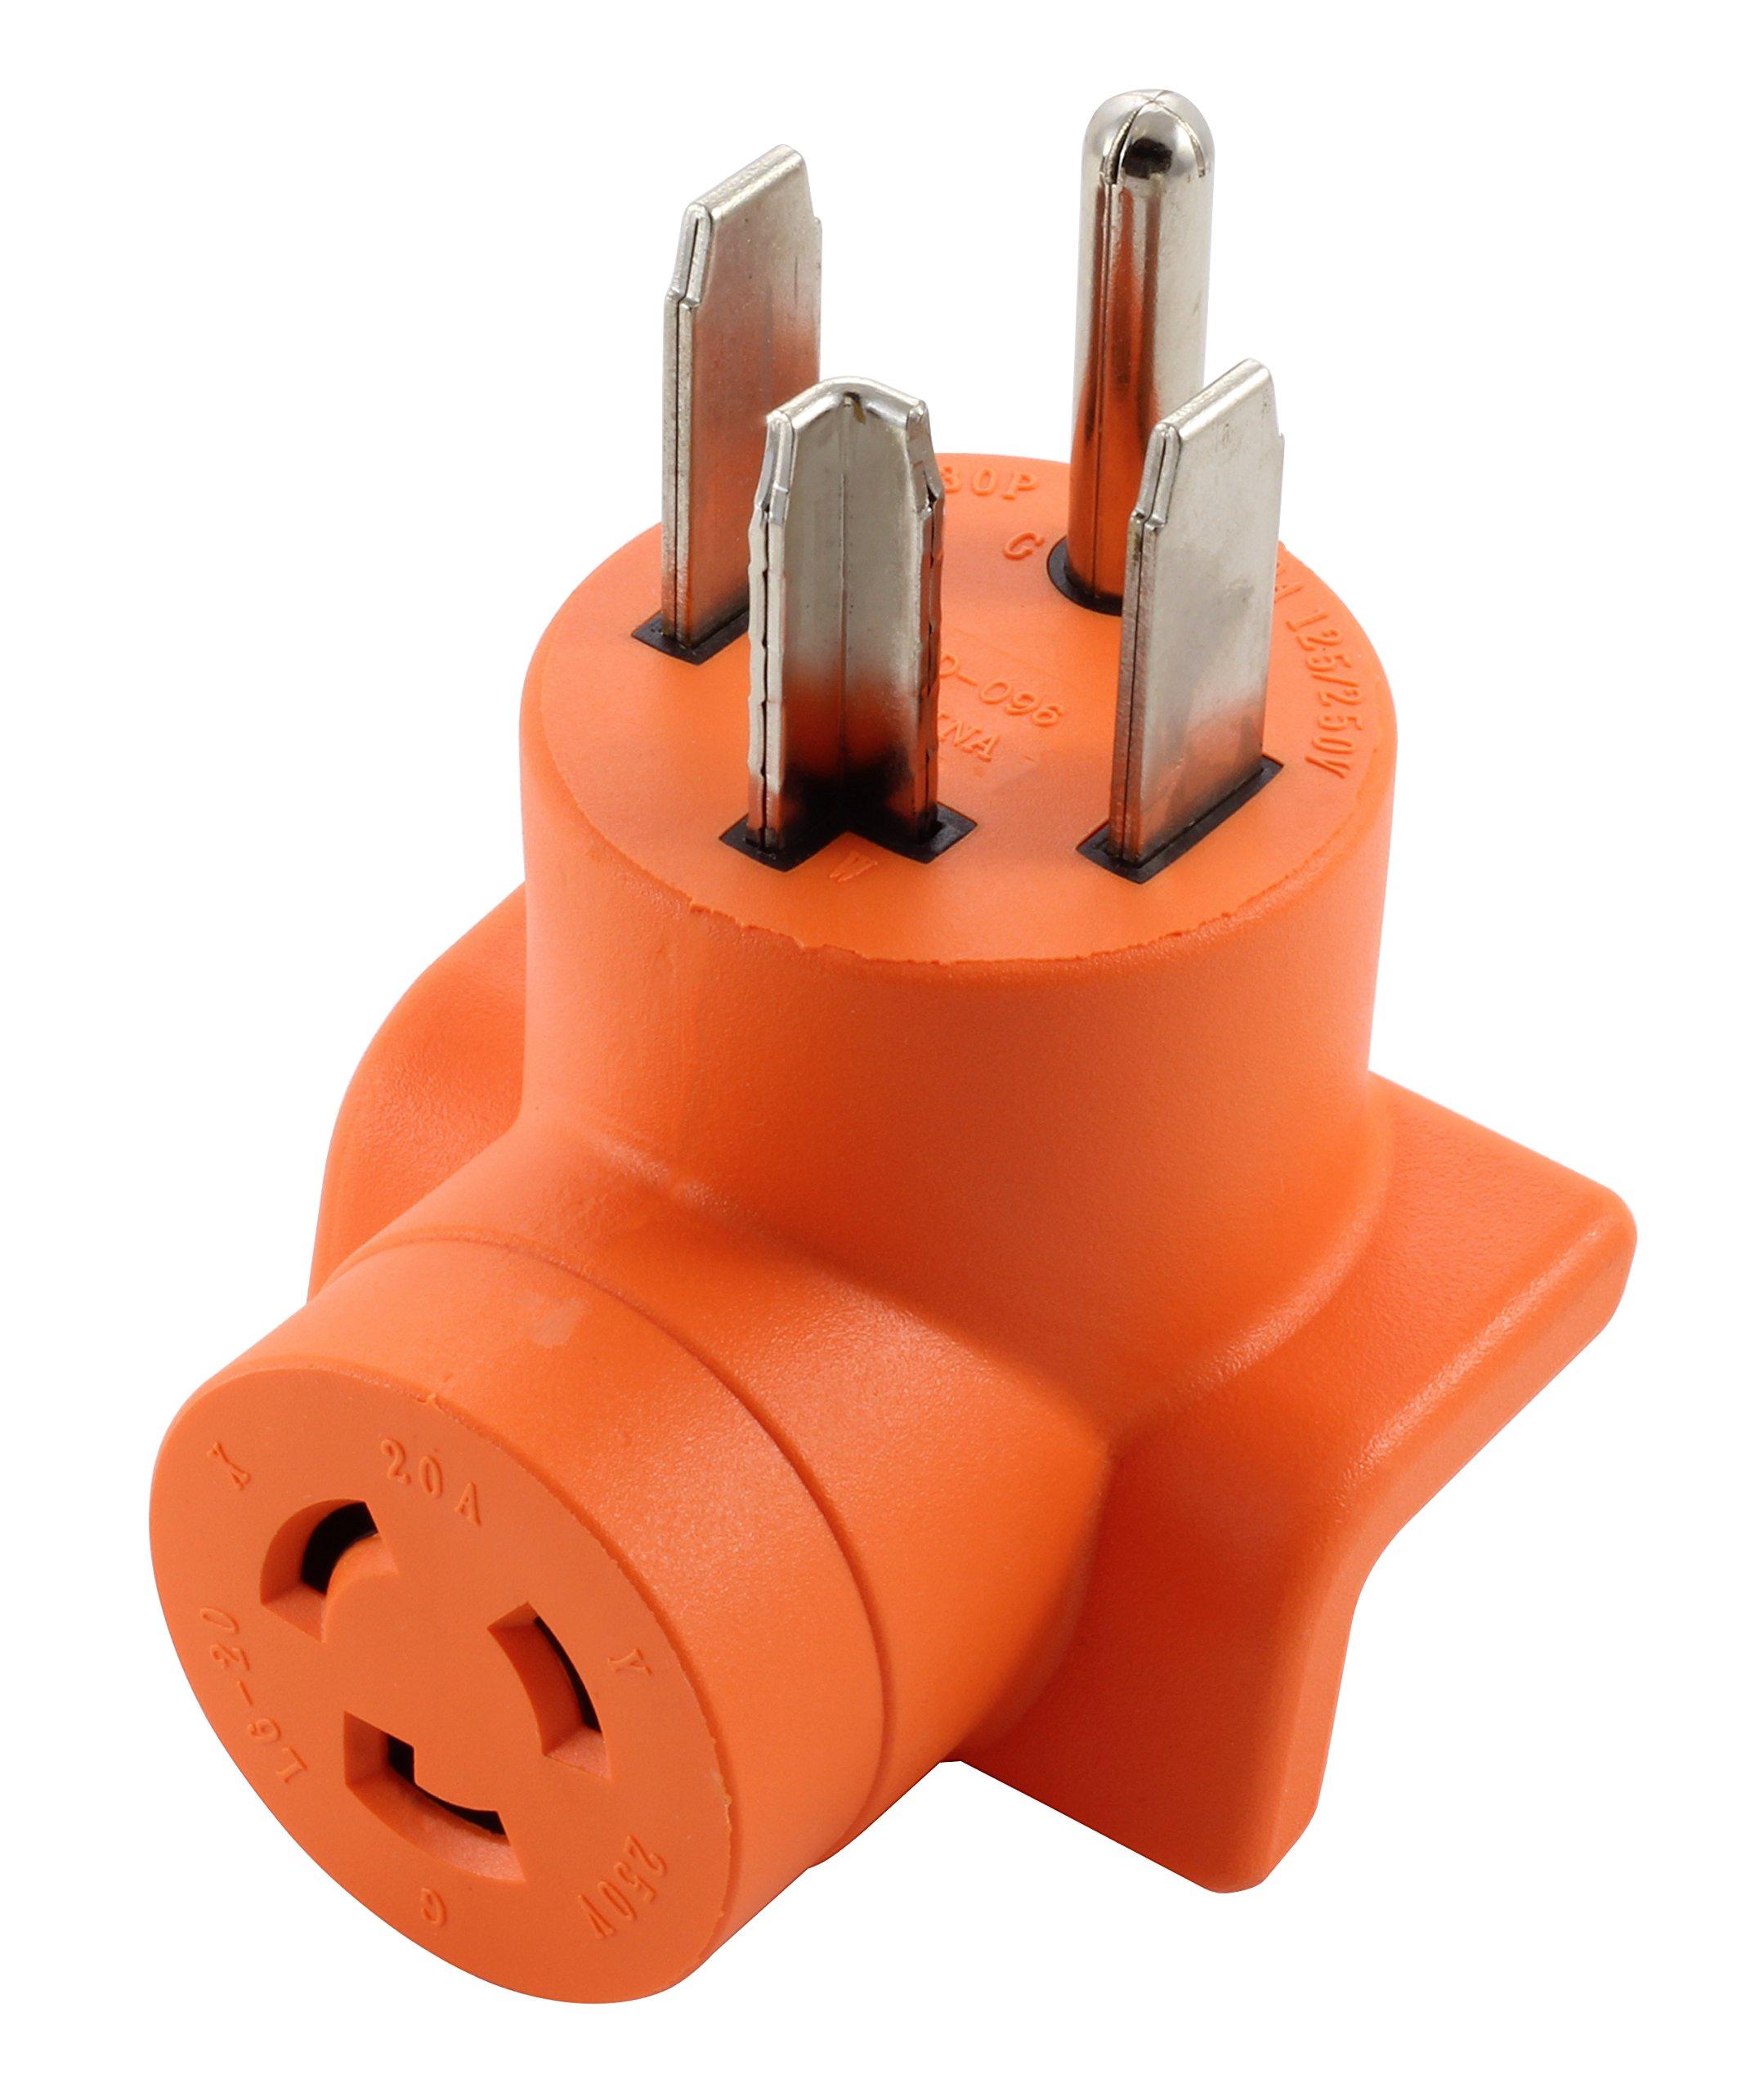 AC WORKS [AD1430L620] Dryer Outlet Adapter NEMA 14-30P 30Amp Dryer Outlet to L6-20R 20Amp 250Volt Locking Female Connector